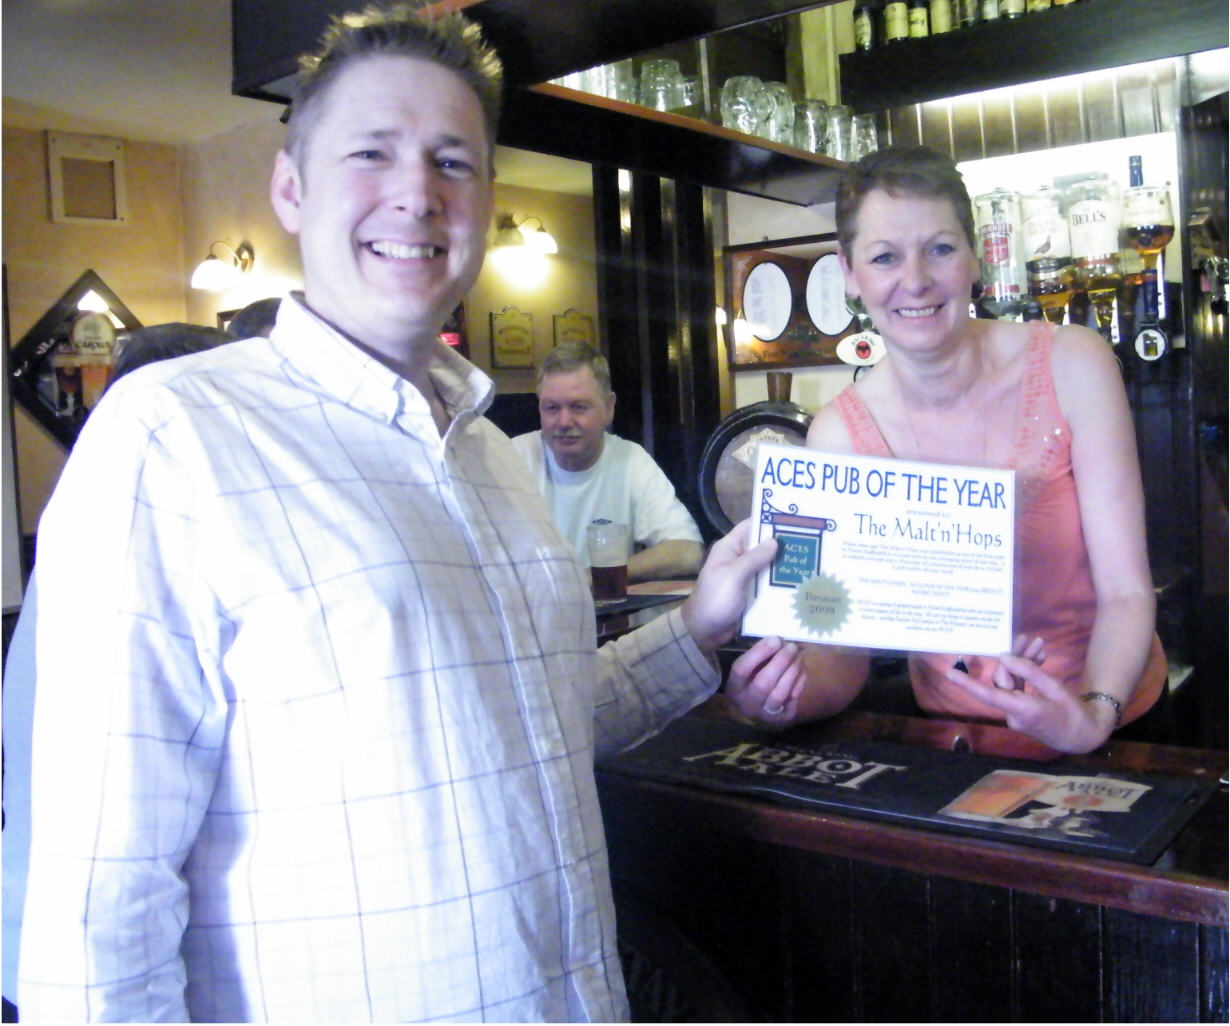 The Malt'n'Hops - Best Pub - Bronze Award (Joint)